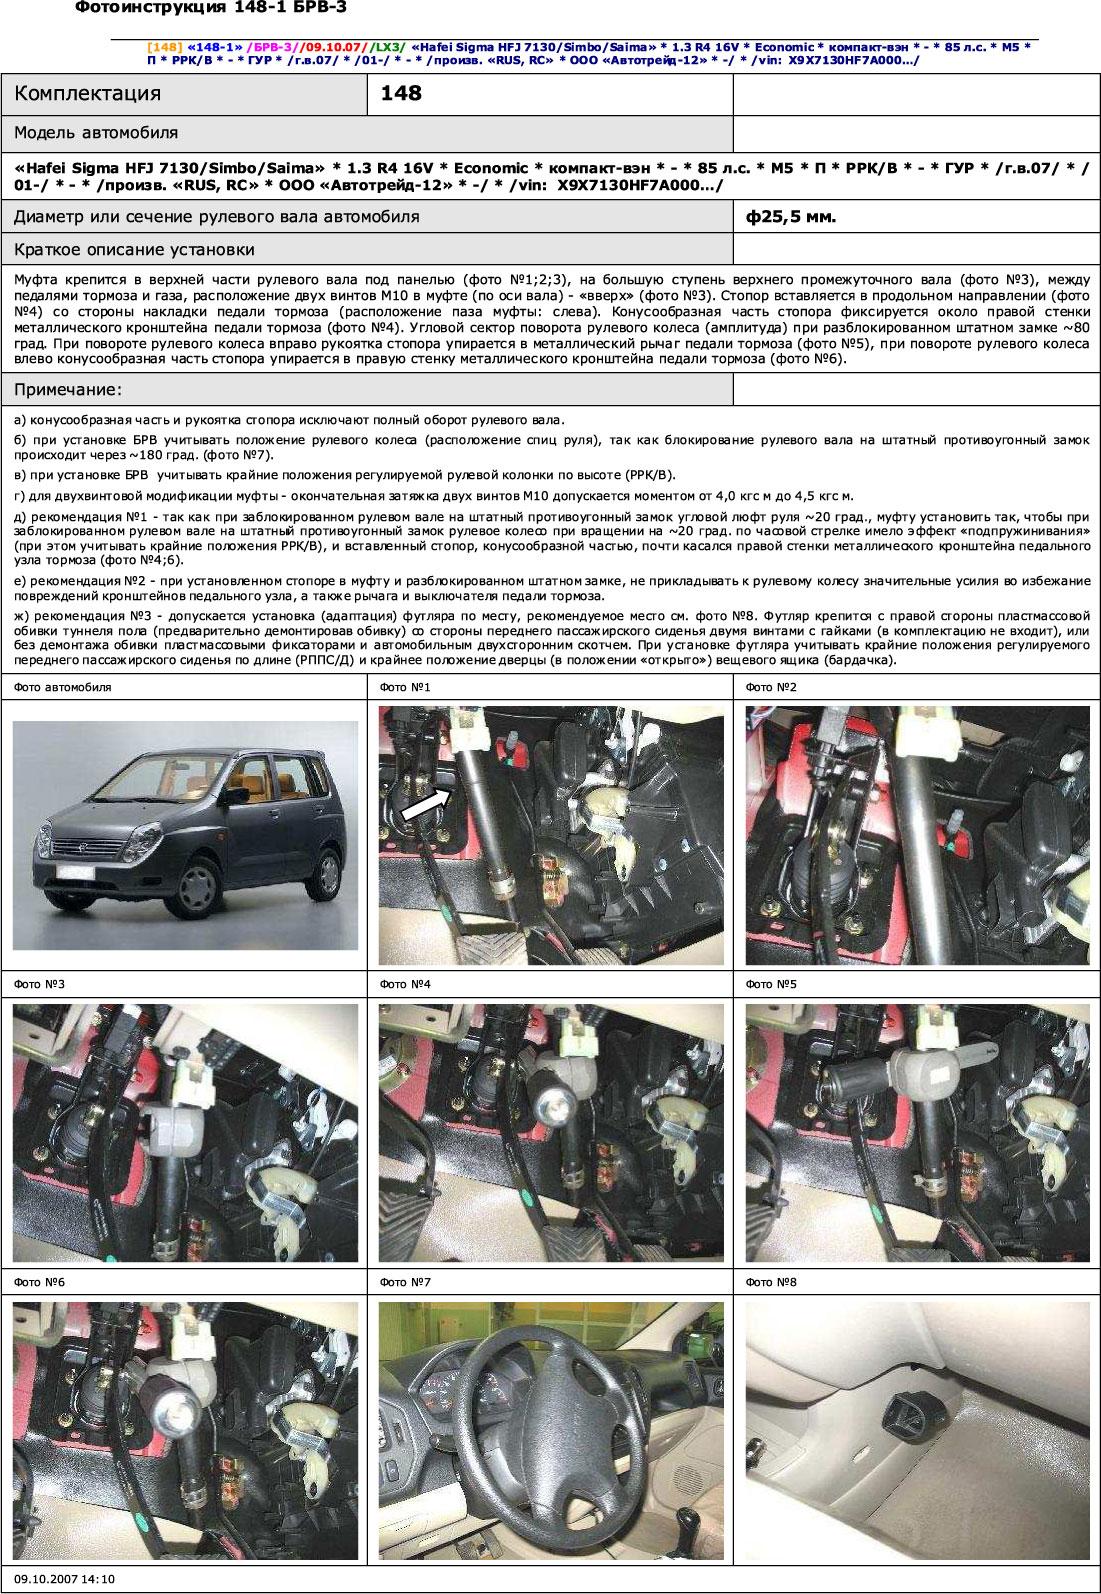 Блокиратор рулевого вала для HAFEY SIMBO/SIGMA/SAIMA /2001-/ ГУР - Гарант Блок Люкс 148.E